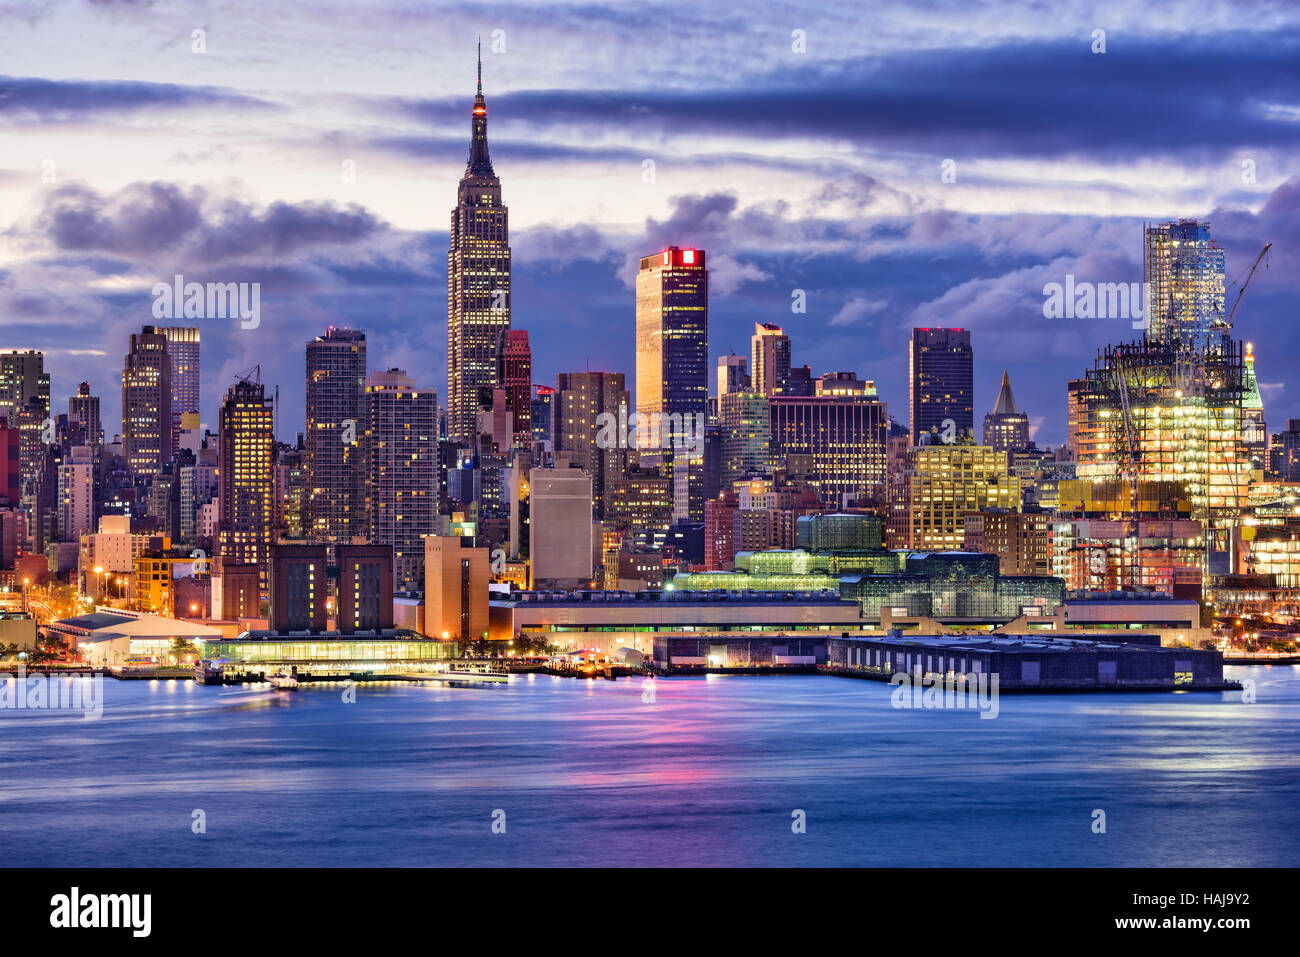 New York City midtown Manhattan skyline across the Hudson River. - Stock Image